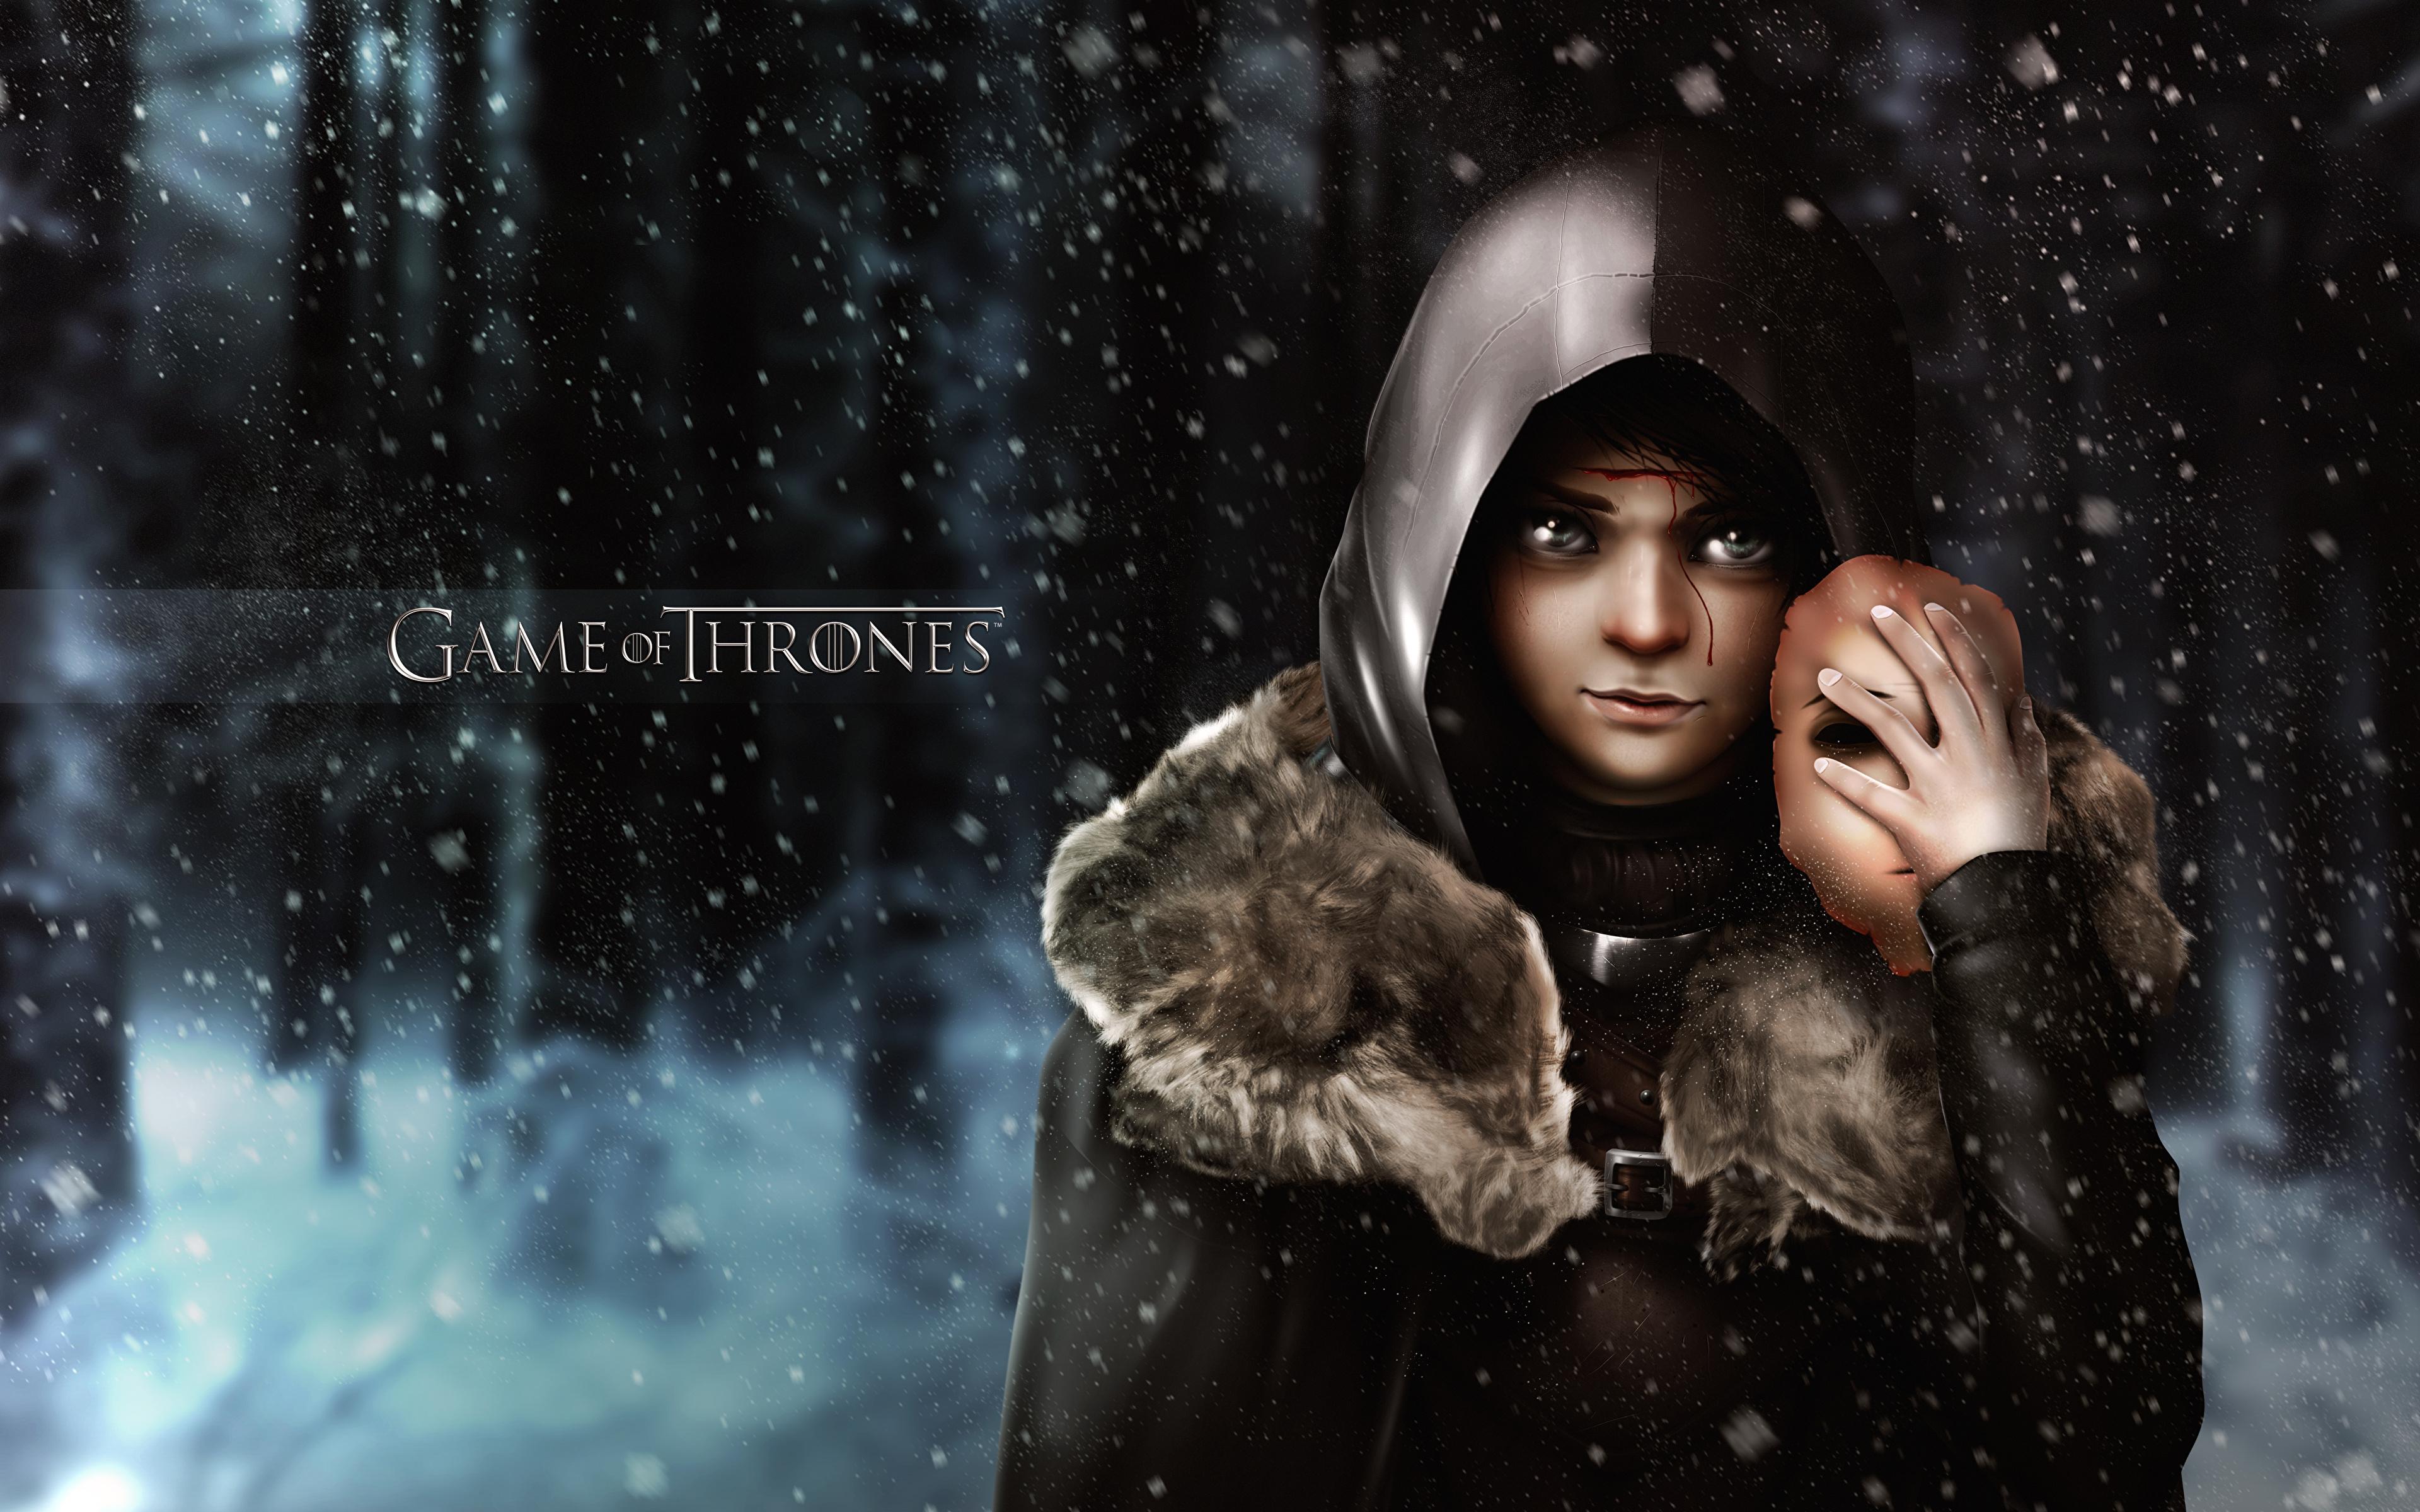 Foto Game Of Thrones Arya Stark Film Kapuze 3840x2400